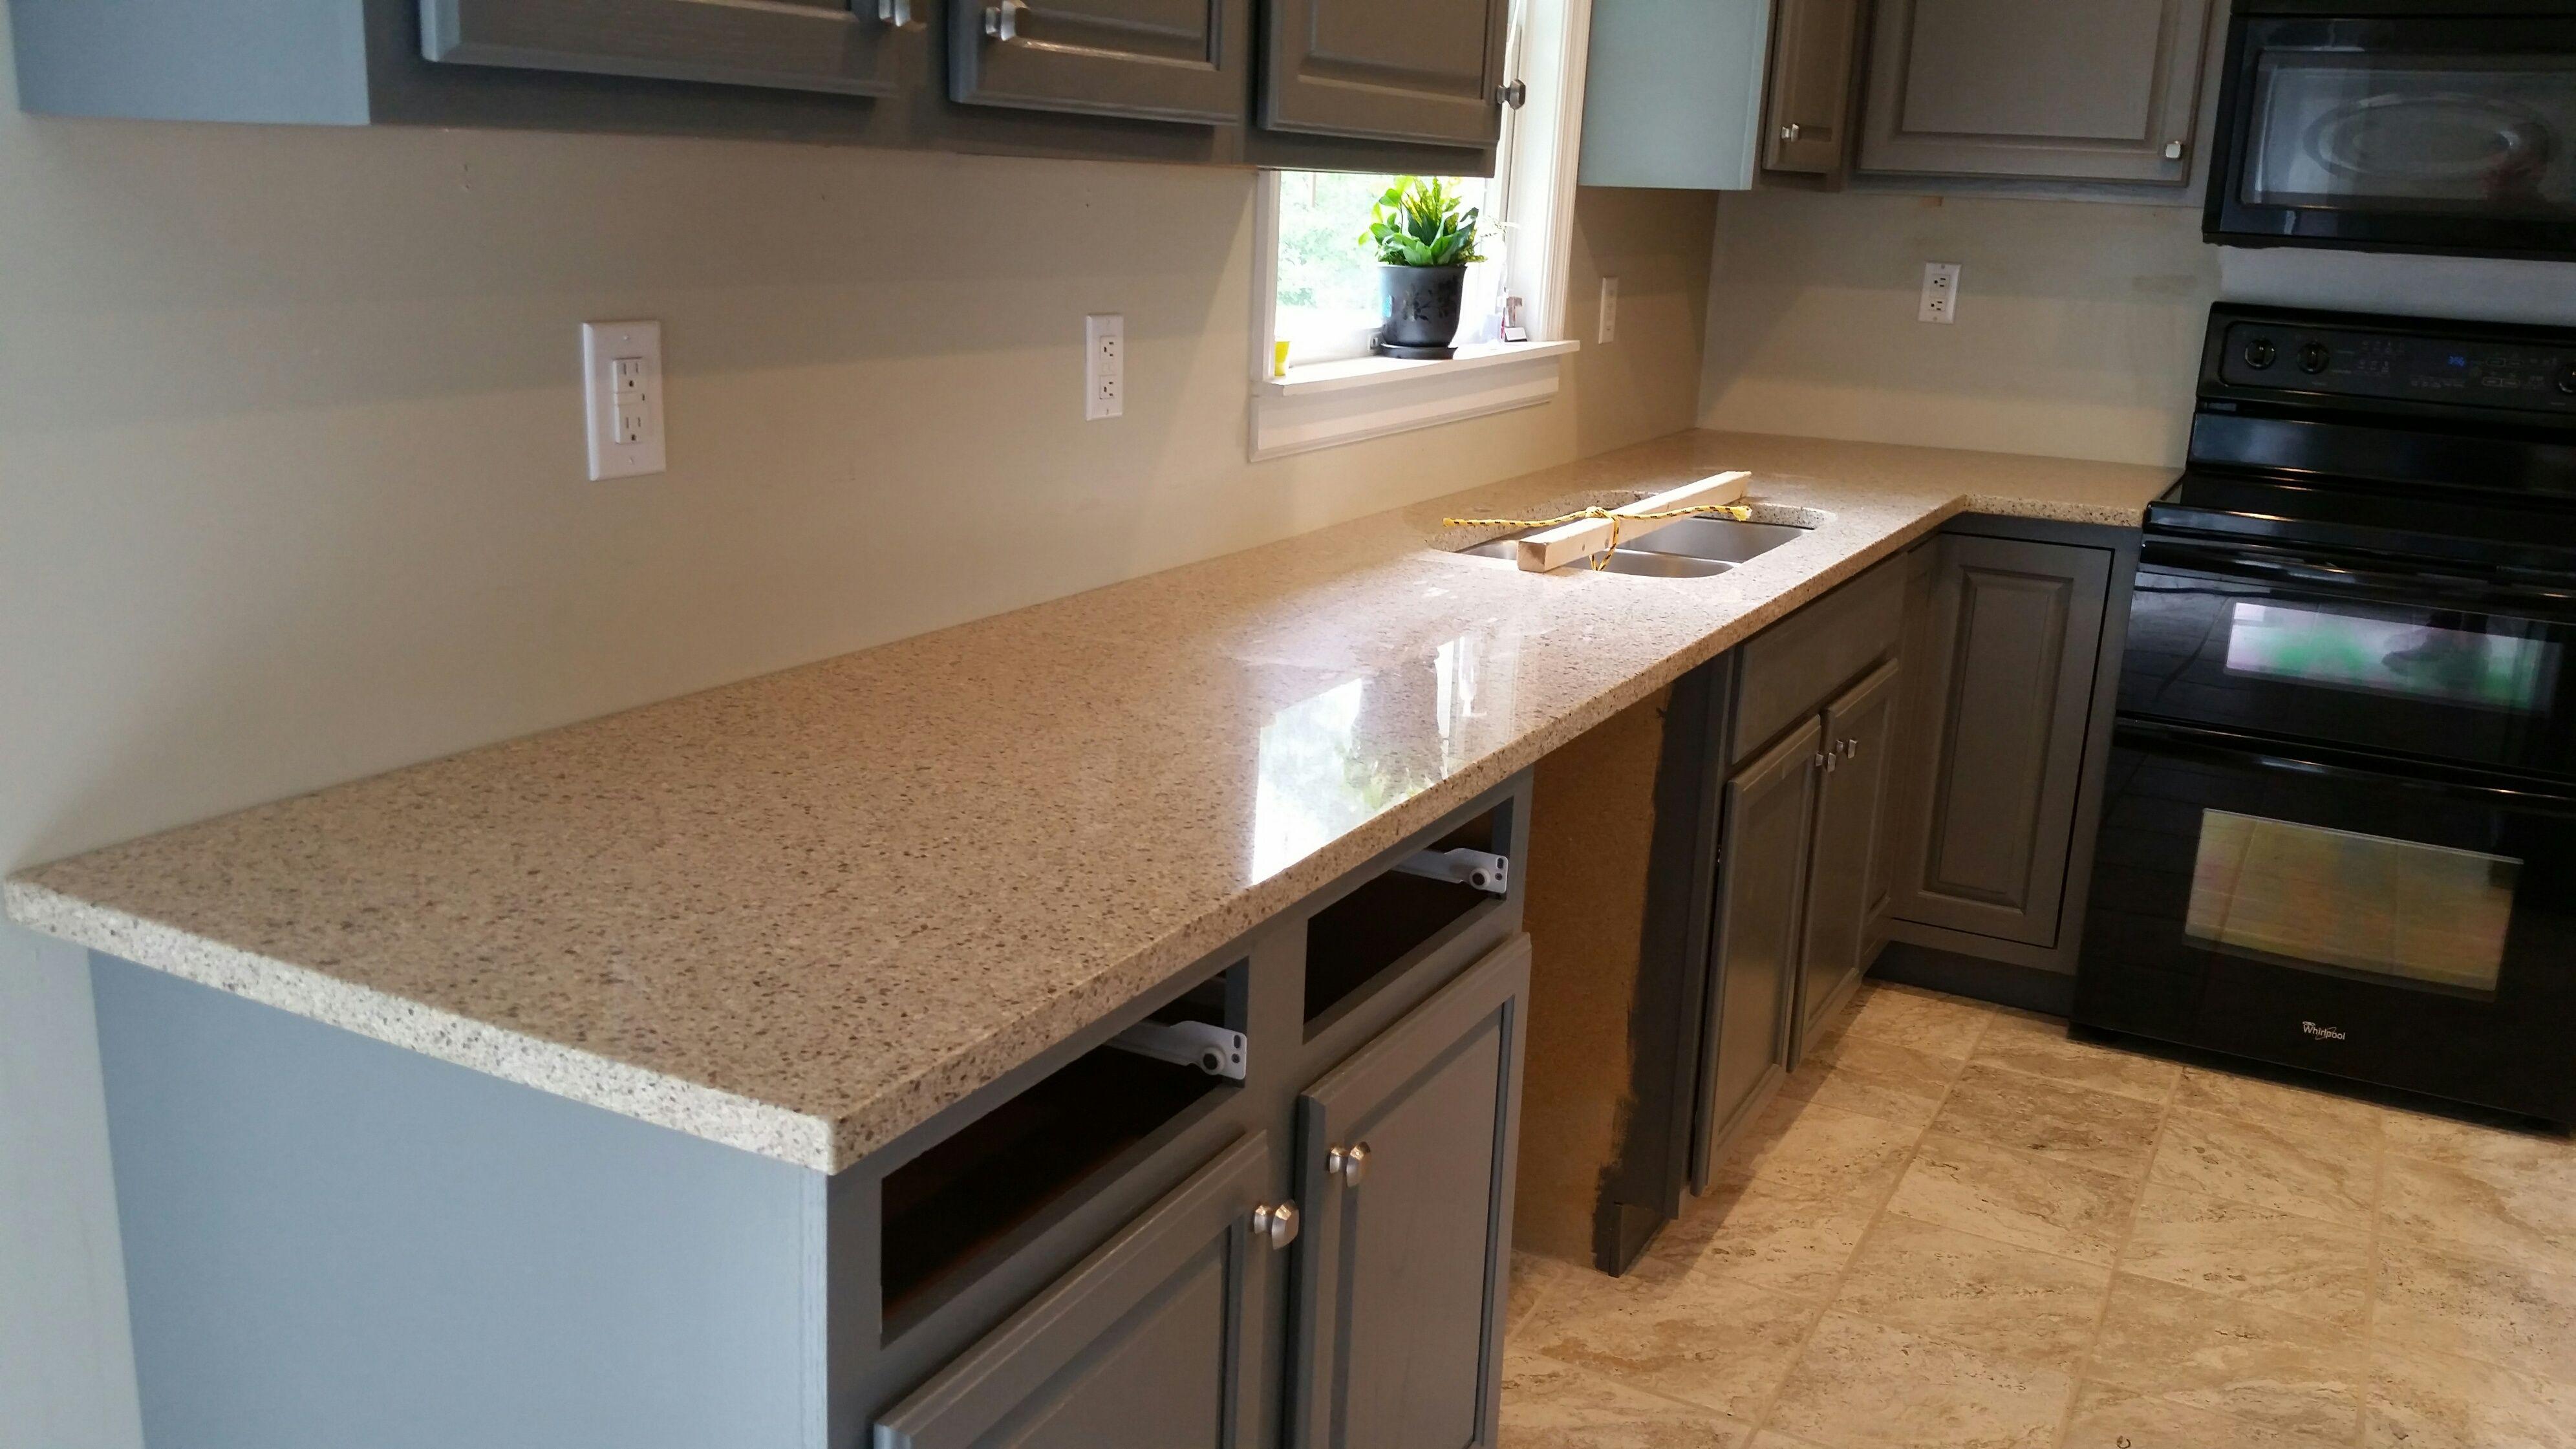 Silver Lake LG Viatera Quartz Kitchen Countertop Install For The Walker  Family. Knoxvilleu0027s Stone Interiors